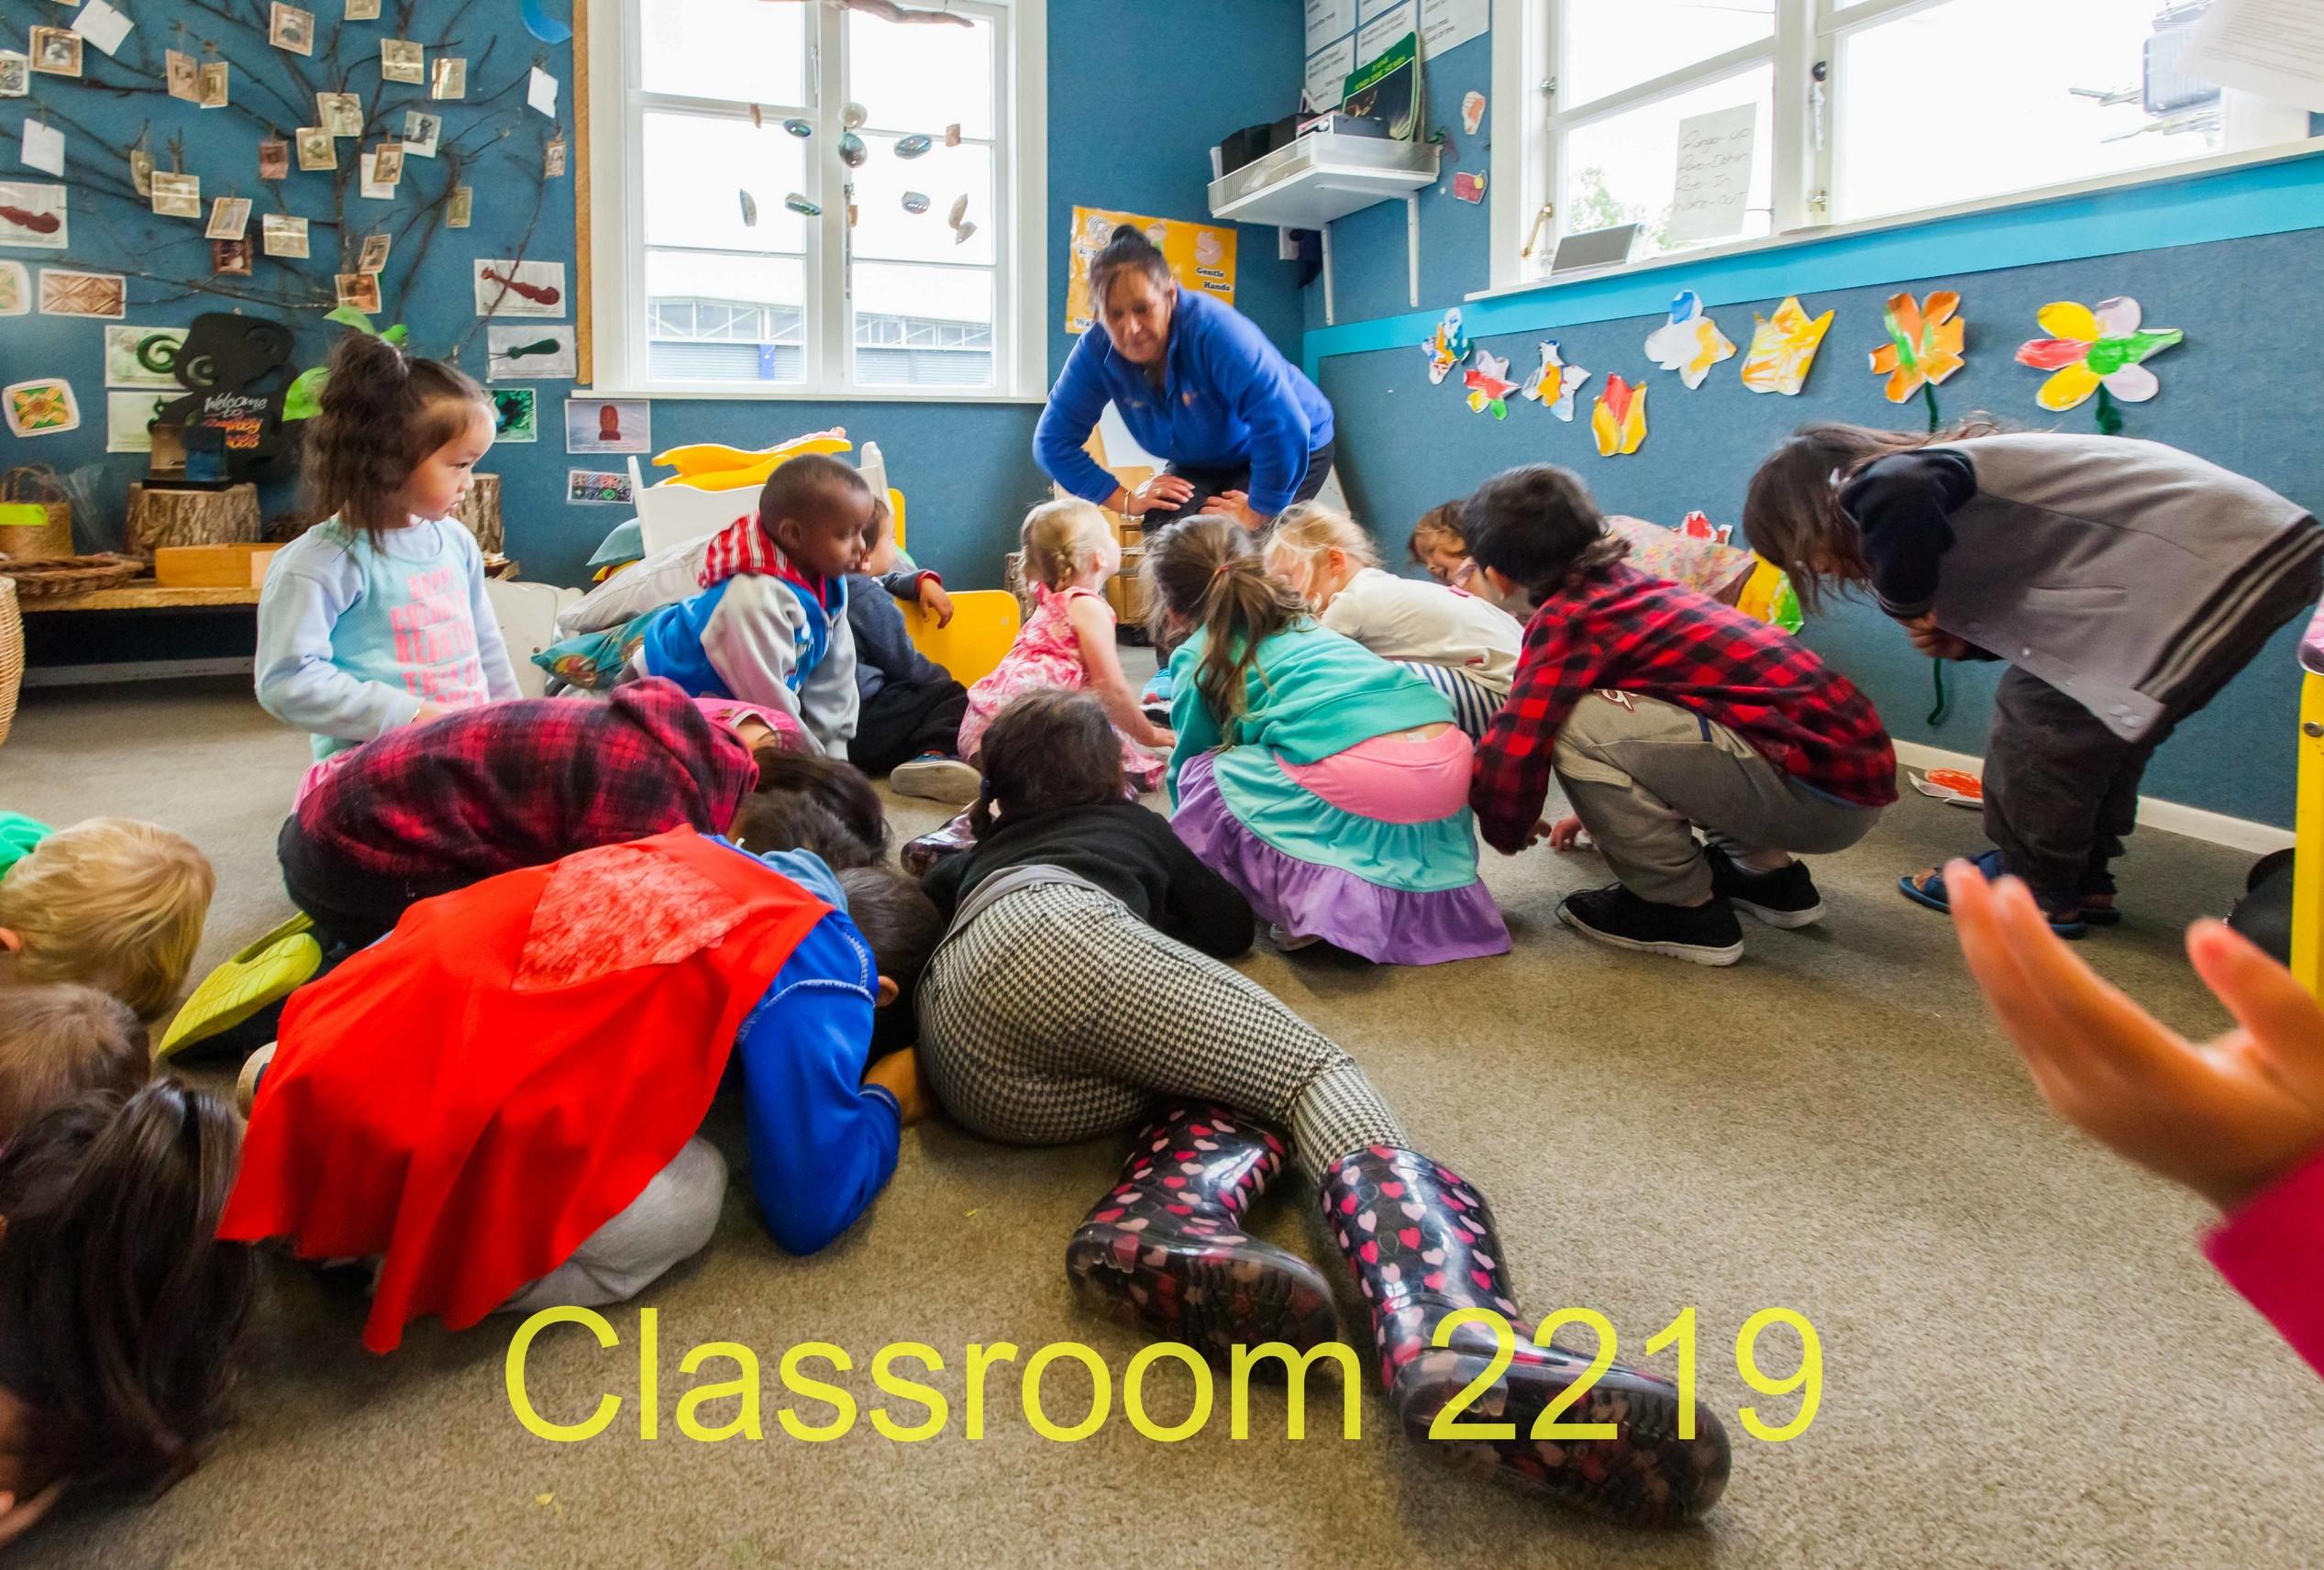 Classroom 2219